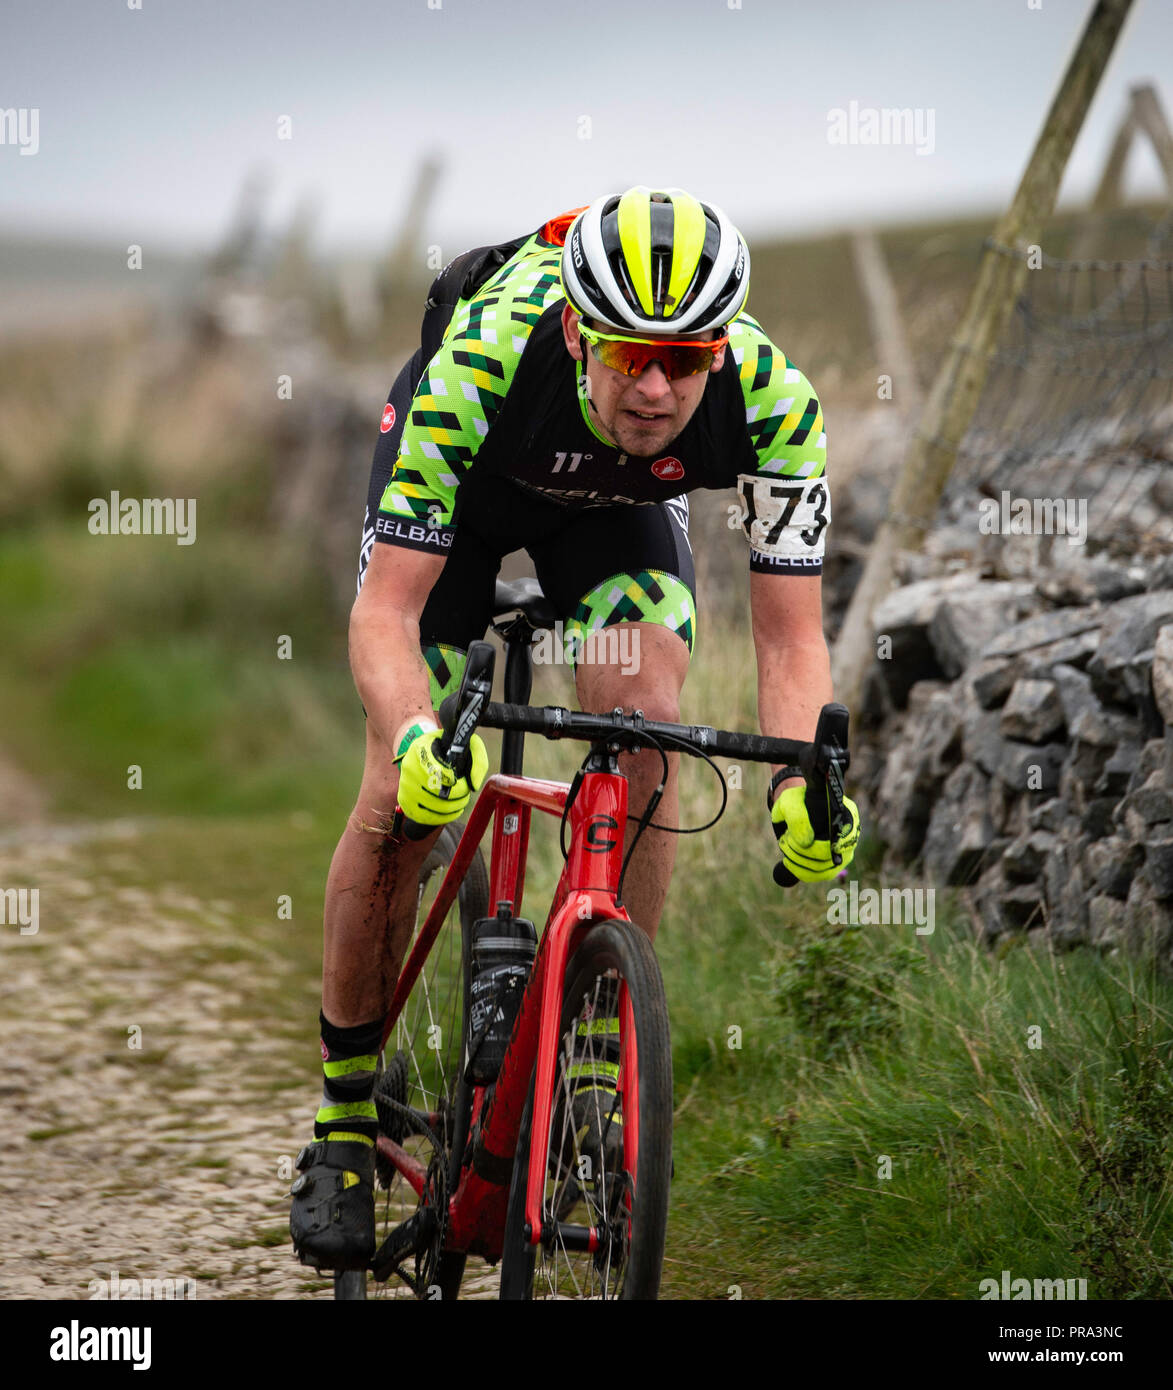 3 Peaks Cyclocross, Yorkshire Dales, UK. - Stock Image